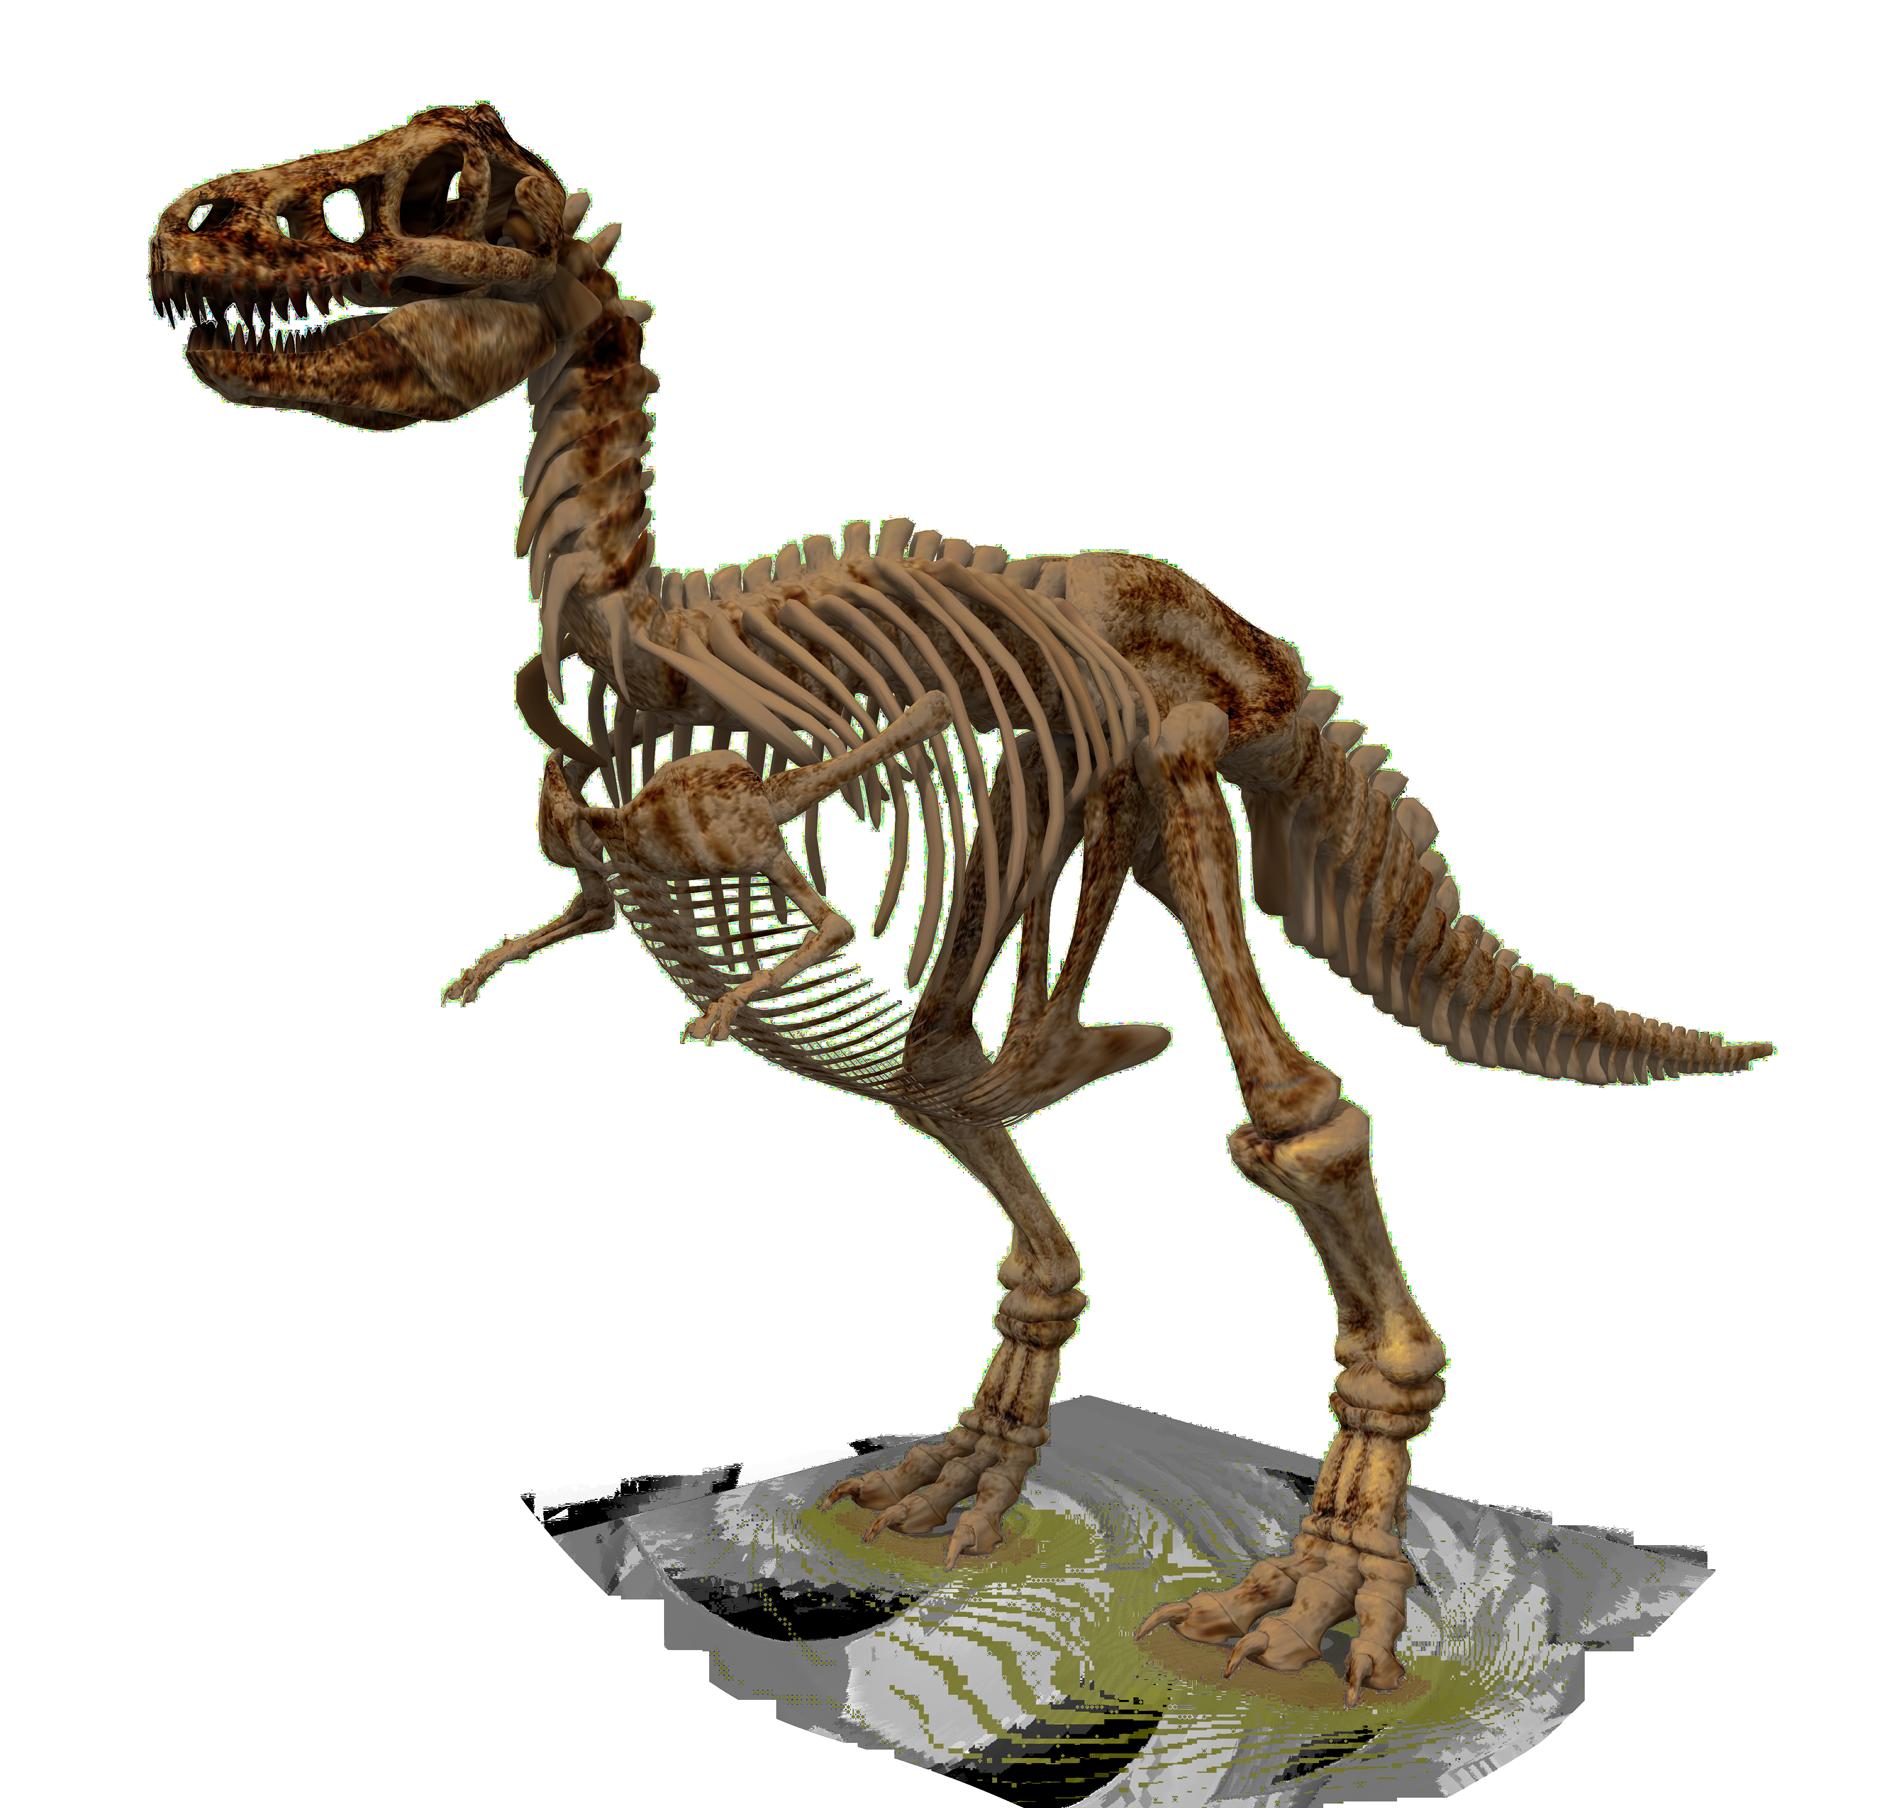 Dinosaur Png Image Dinosaur Png Png Images